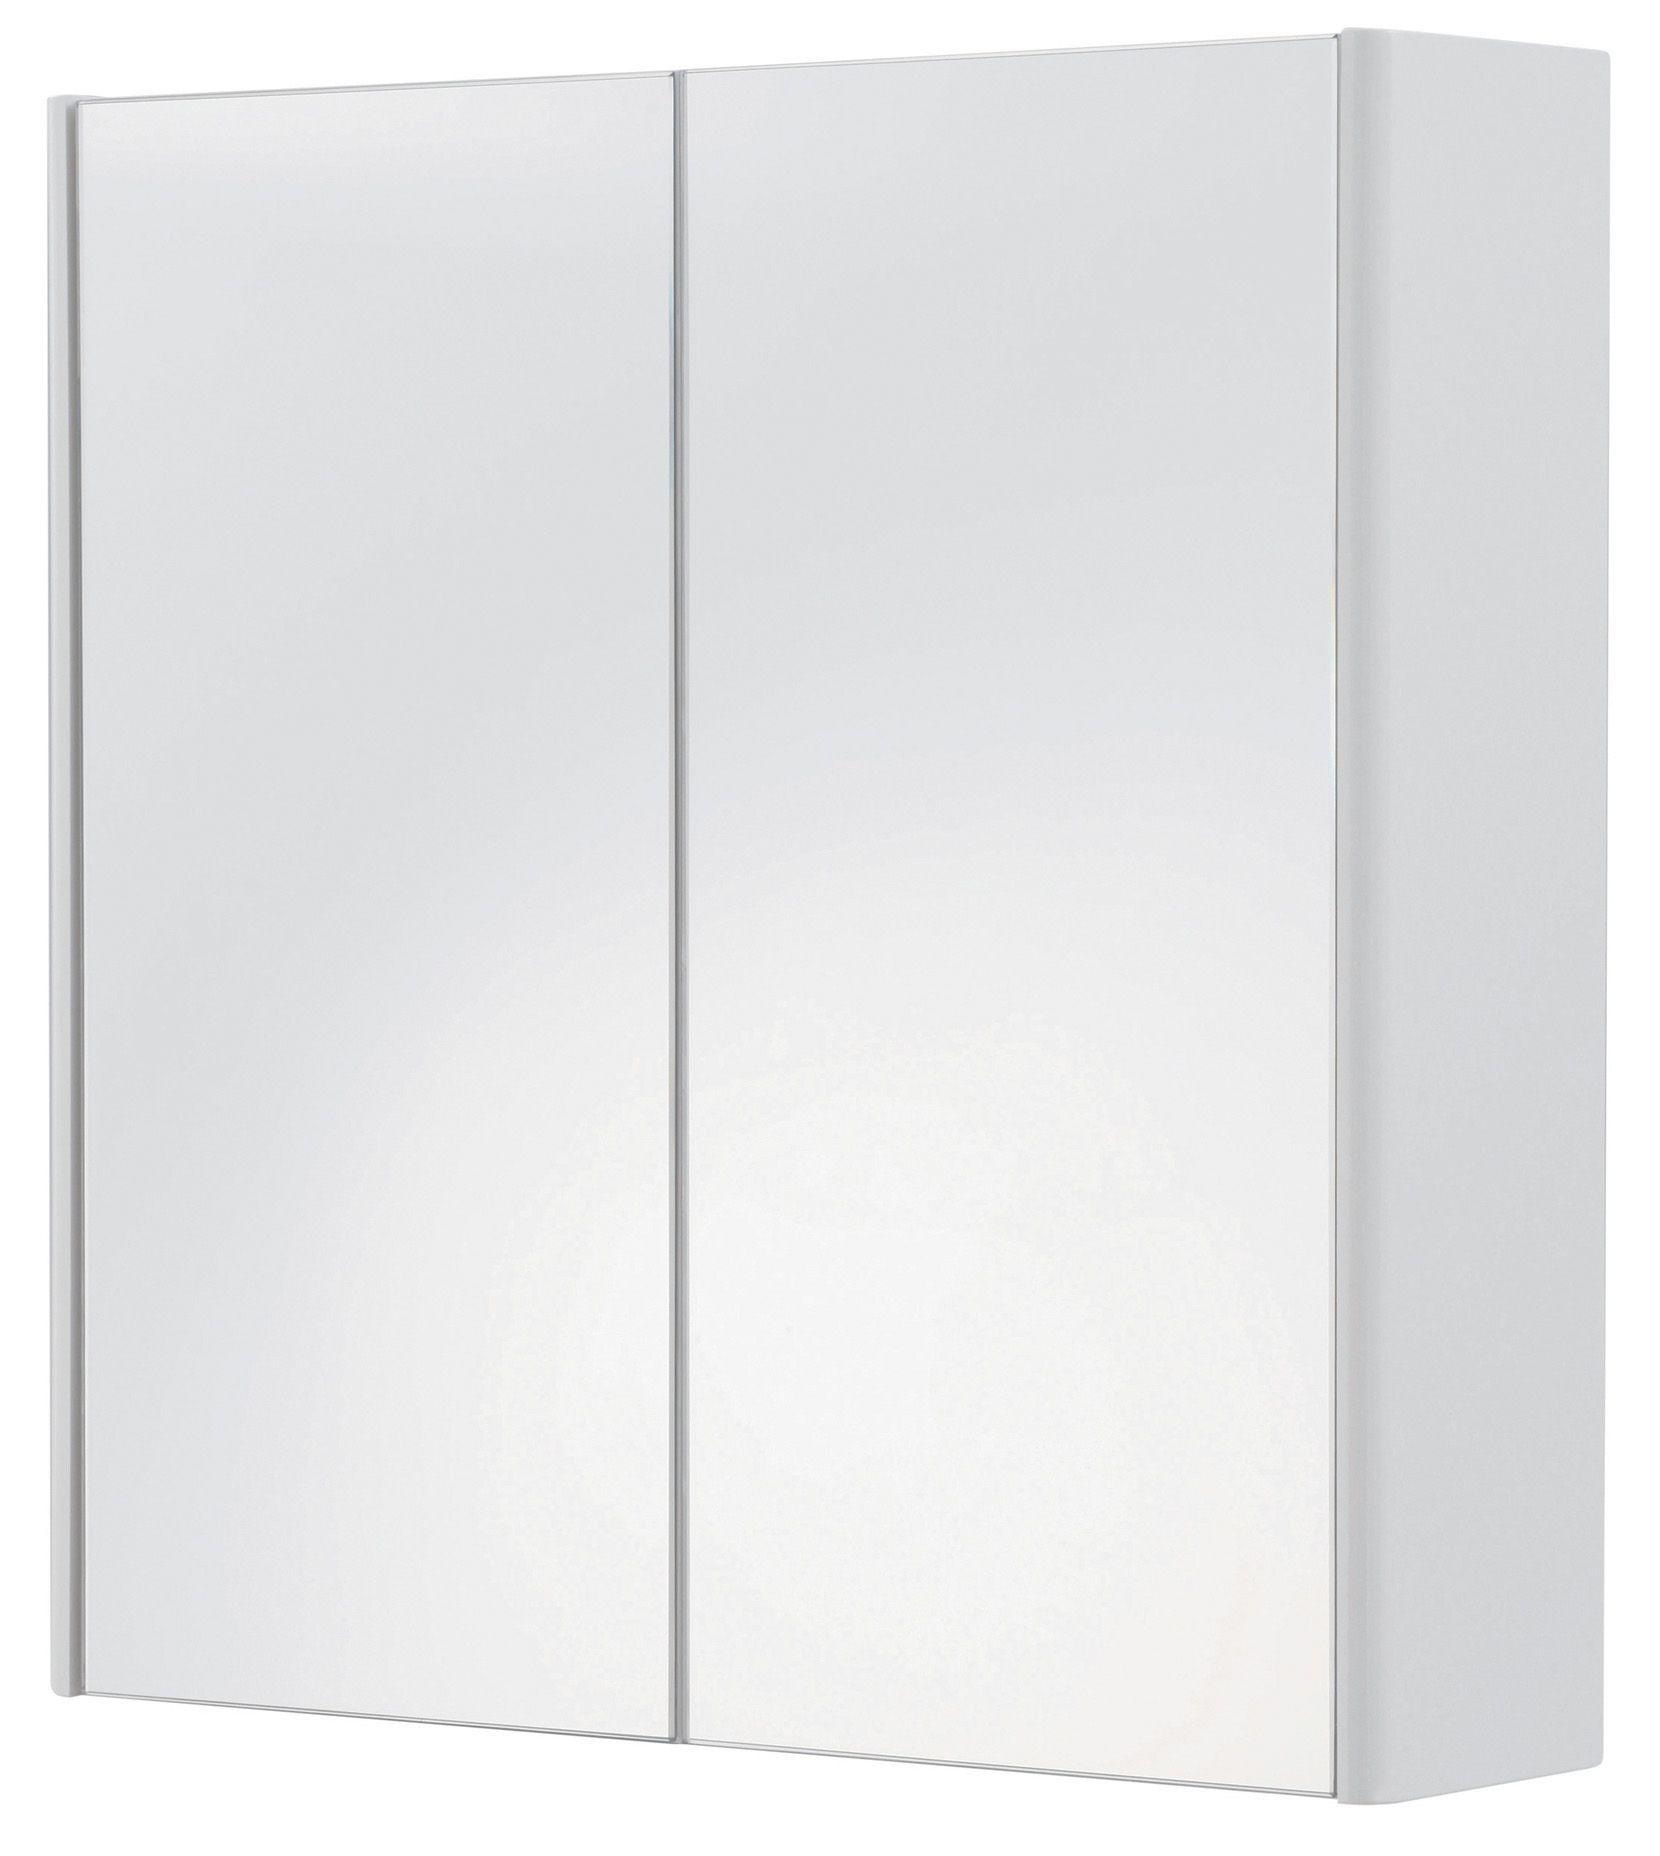 Cooke & Lewis Tobique Double door White Mirror cabinet ...